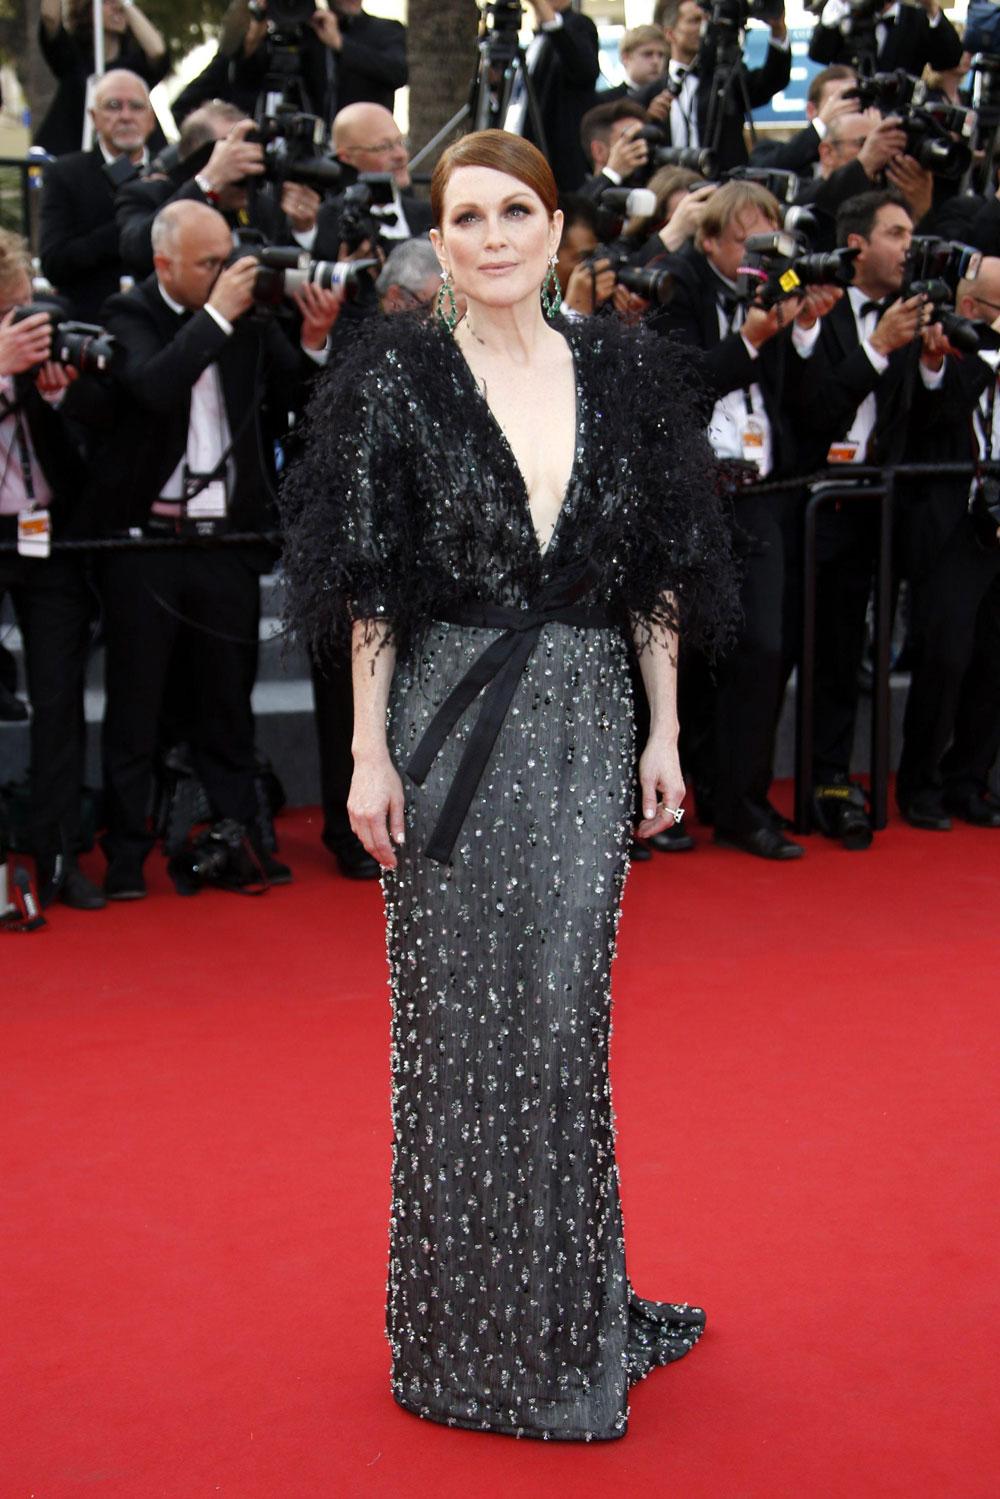 Festival di Cannes 2015, la giornata di Garrone - In foto Julianne Moore  sul red carpet di <em>La Tête haute</em>.